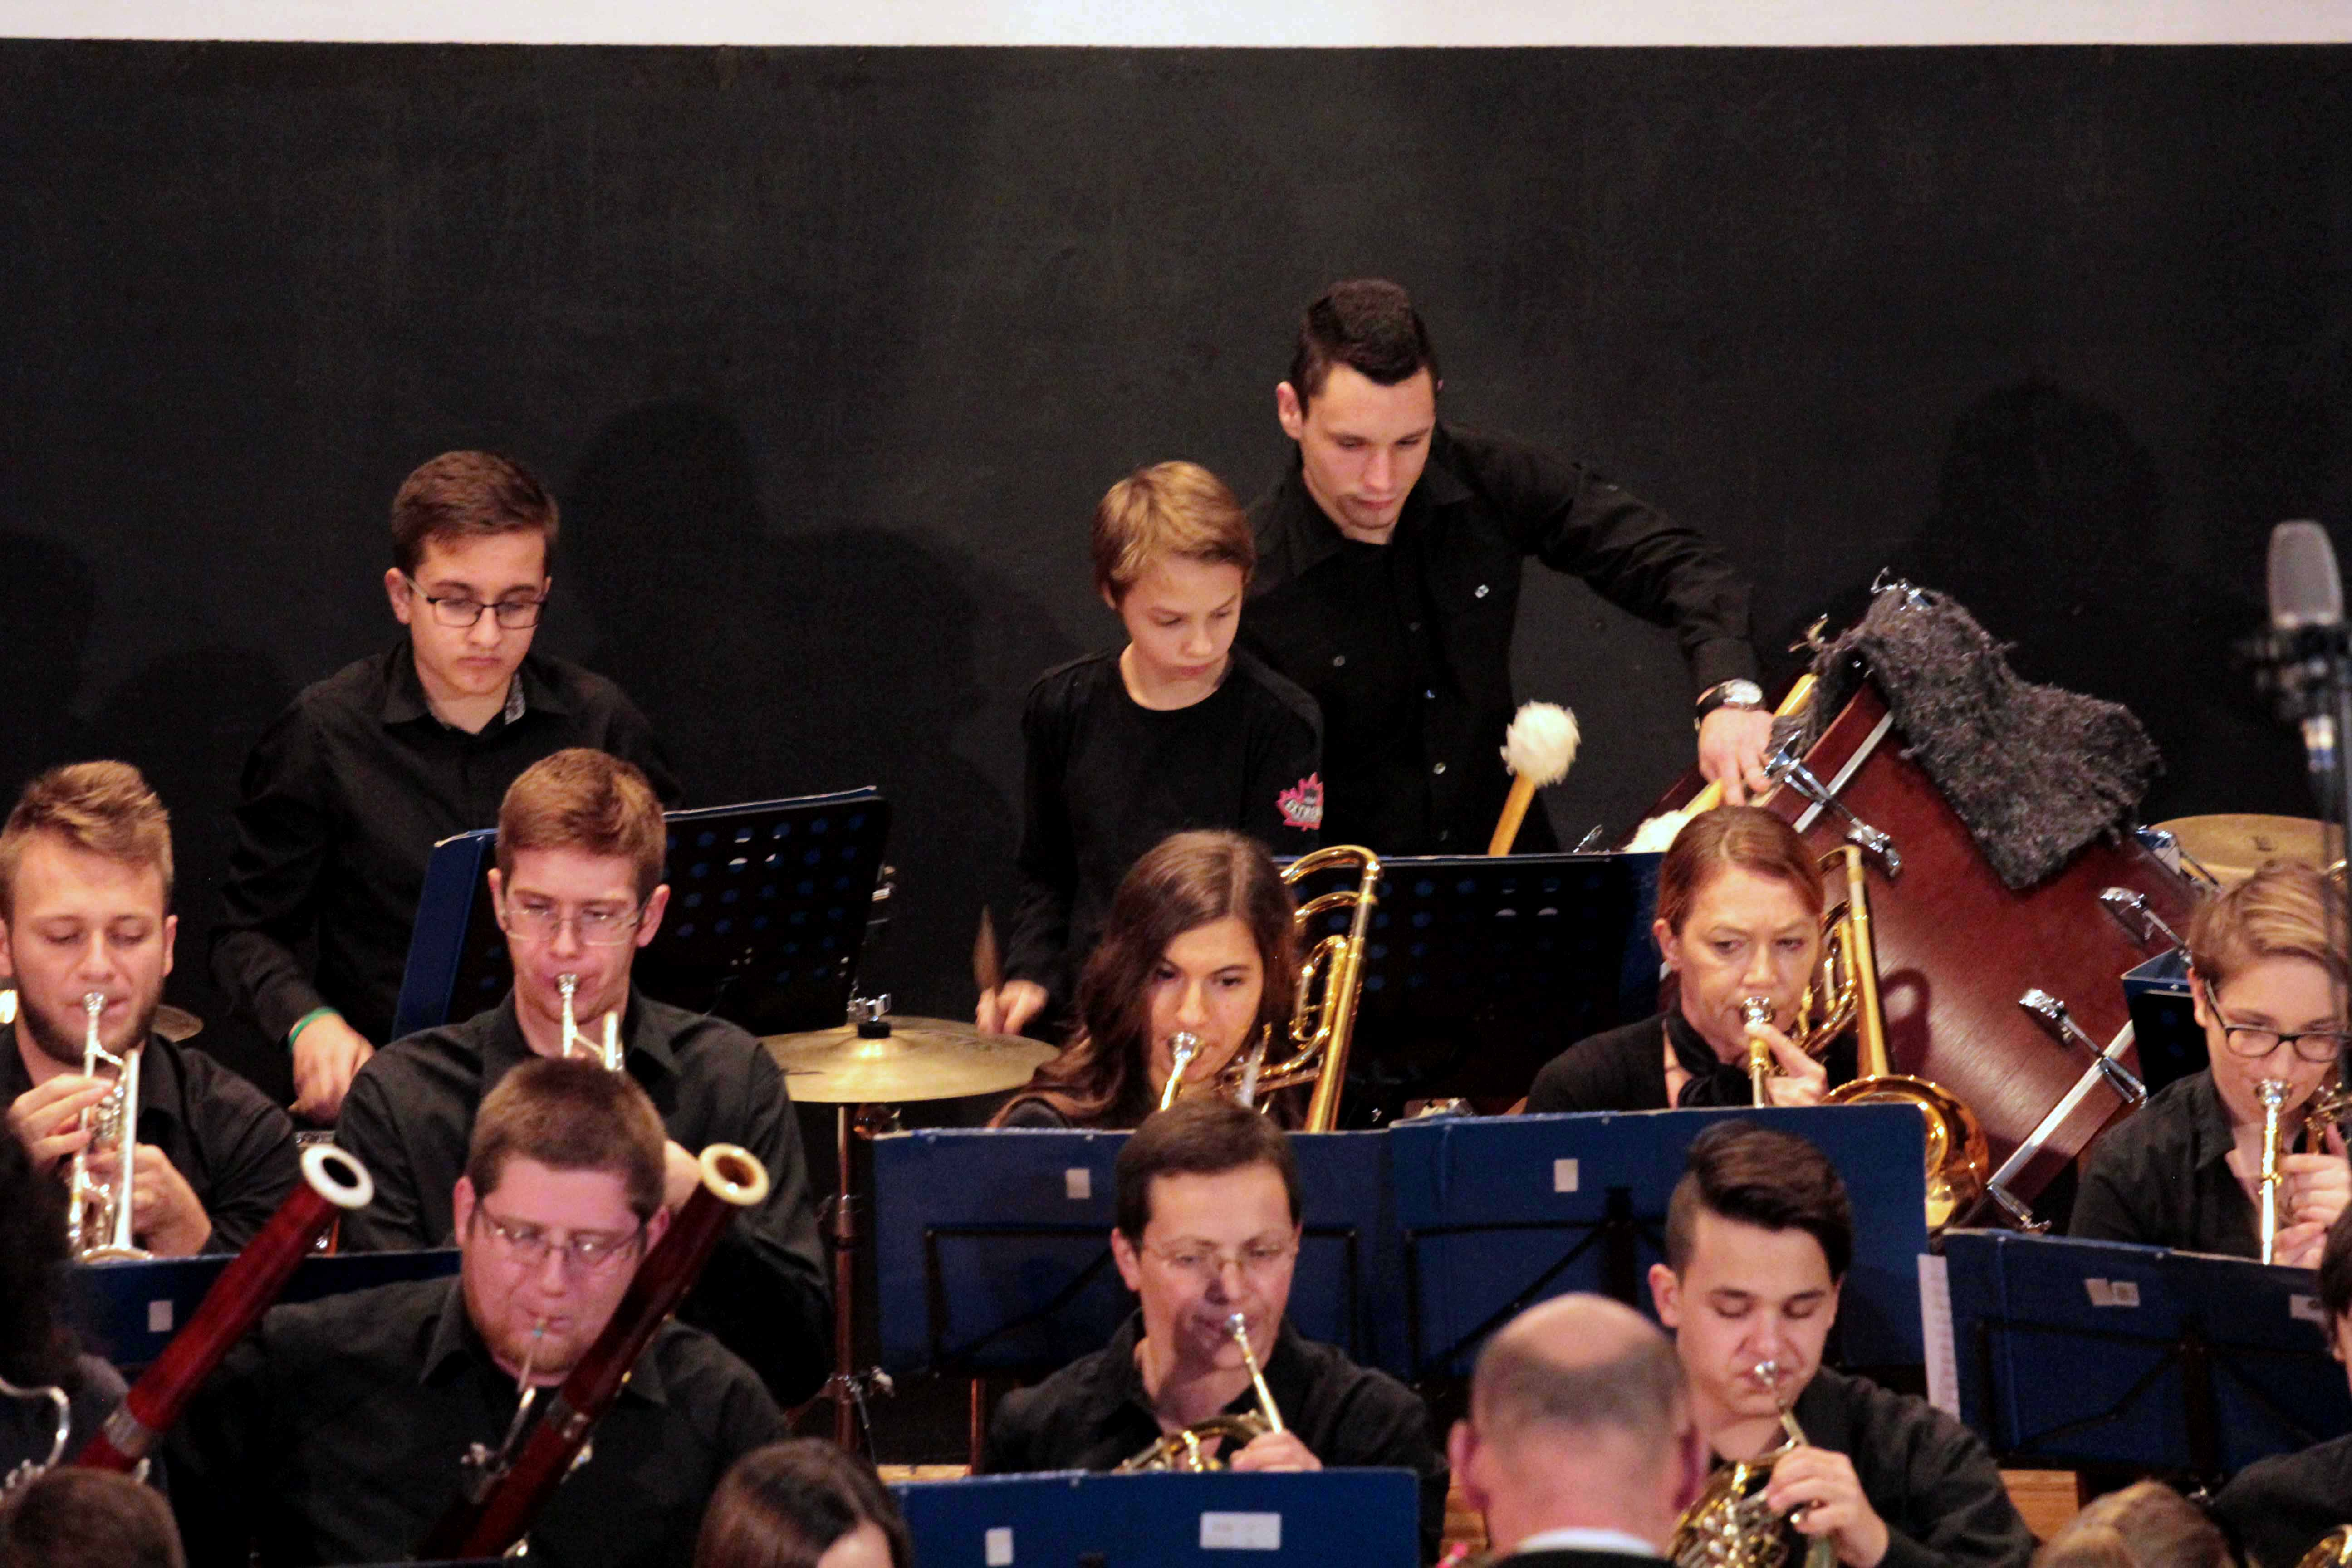 5-godisnji-koncert-puhacki-orkestar-2016-by-milan-mimi-petic